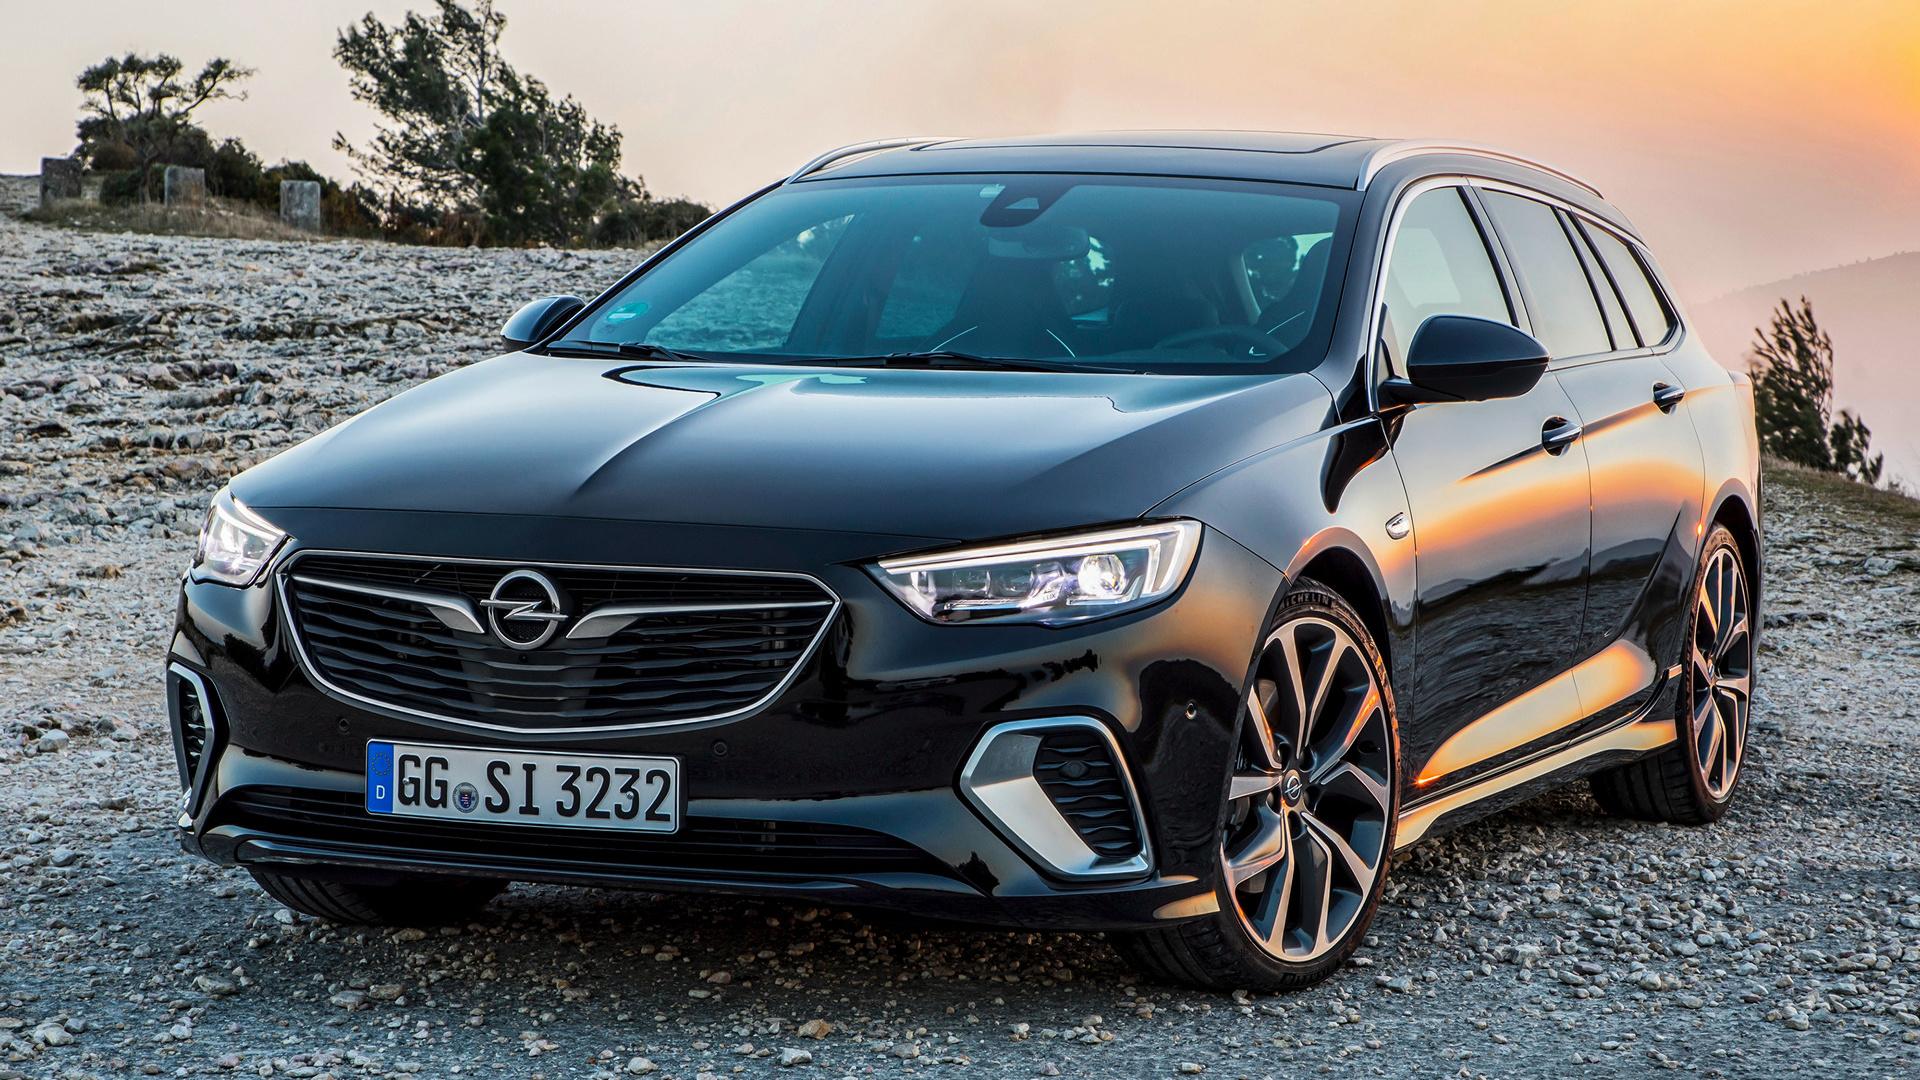 2017 Opel Insignia Gsi Sports Tourer Papel De Parede Hd Plano De Fundo 1920x1080 Id 1101299 Wallpaper Abyss